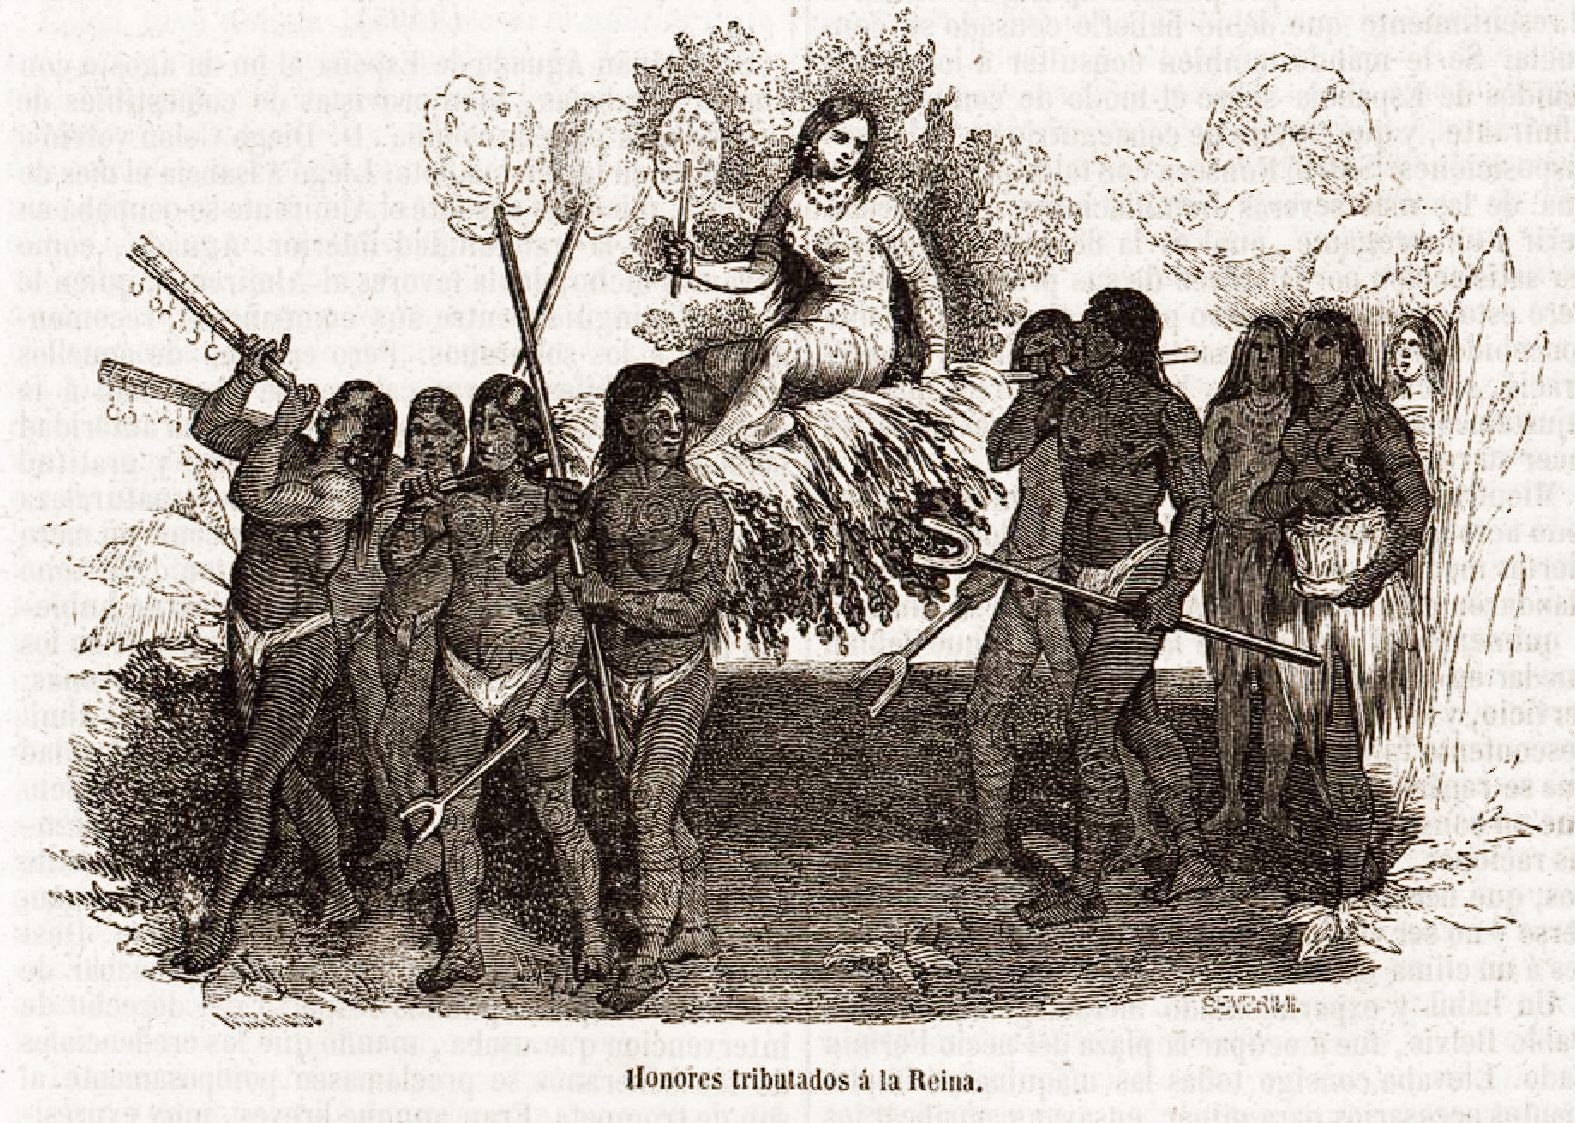 Файл:Vida y viajes de Cristóbal Colón-1852-Honores Tributados à la Reina